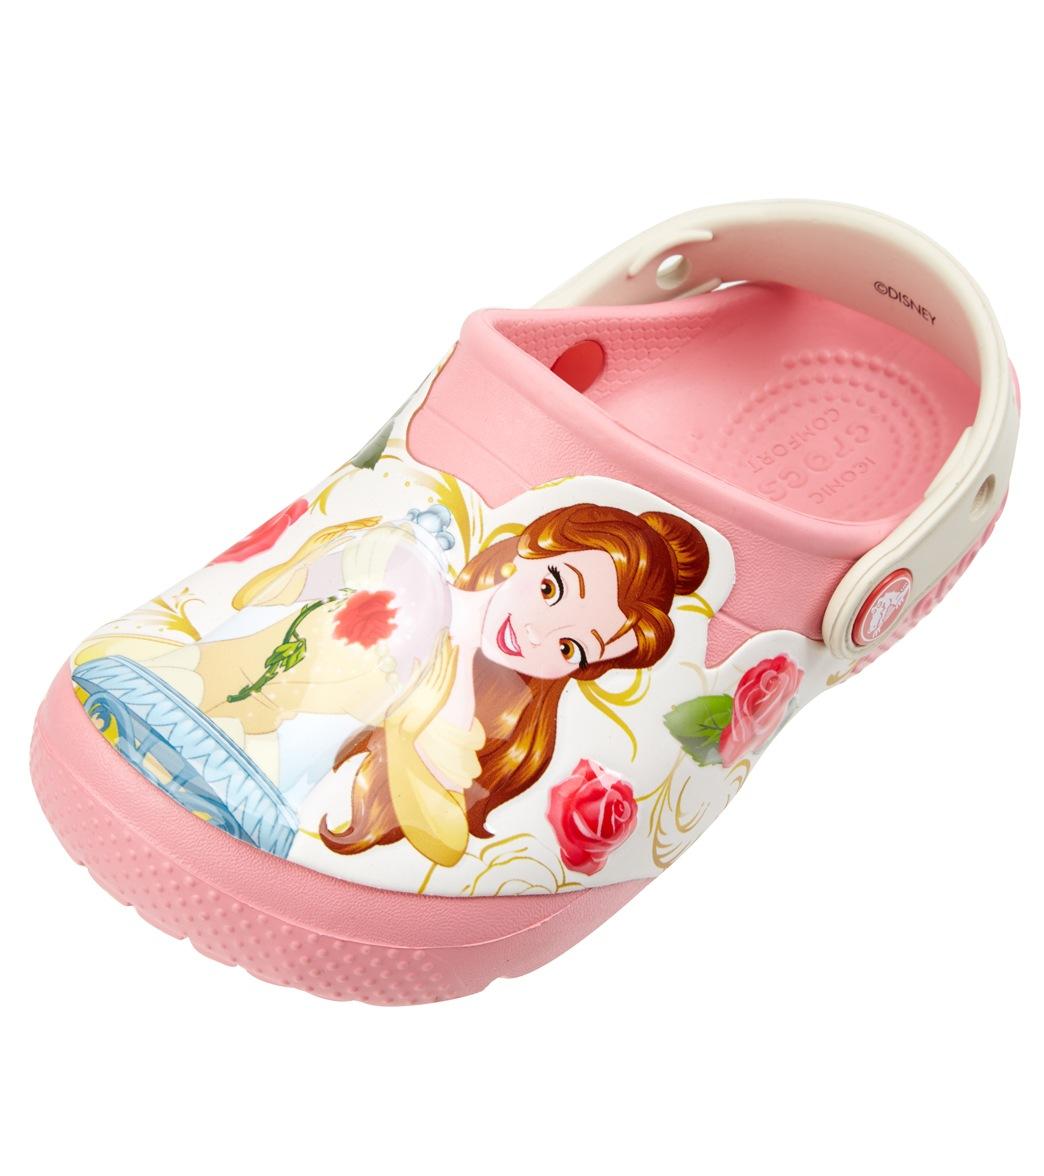 84094f14a4e9a5 Crocs Girls  FunLab Princess Belle (Toddler